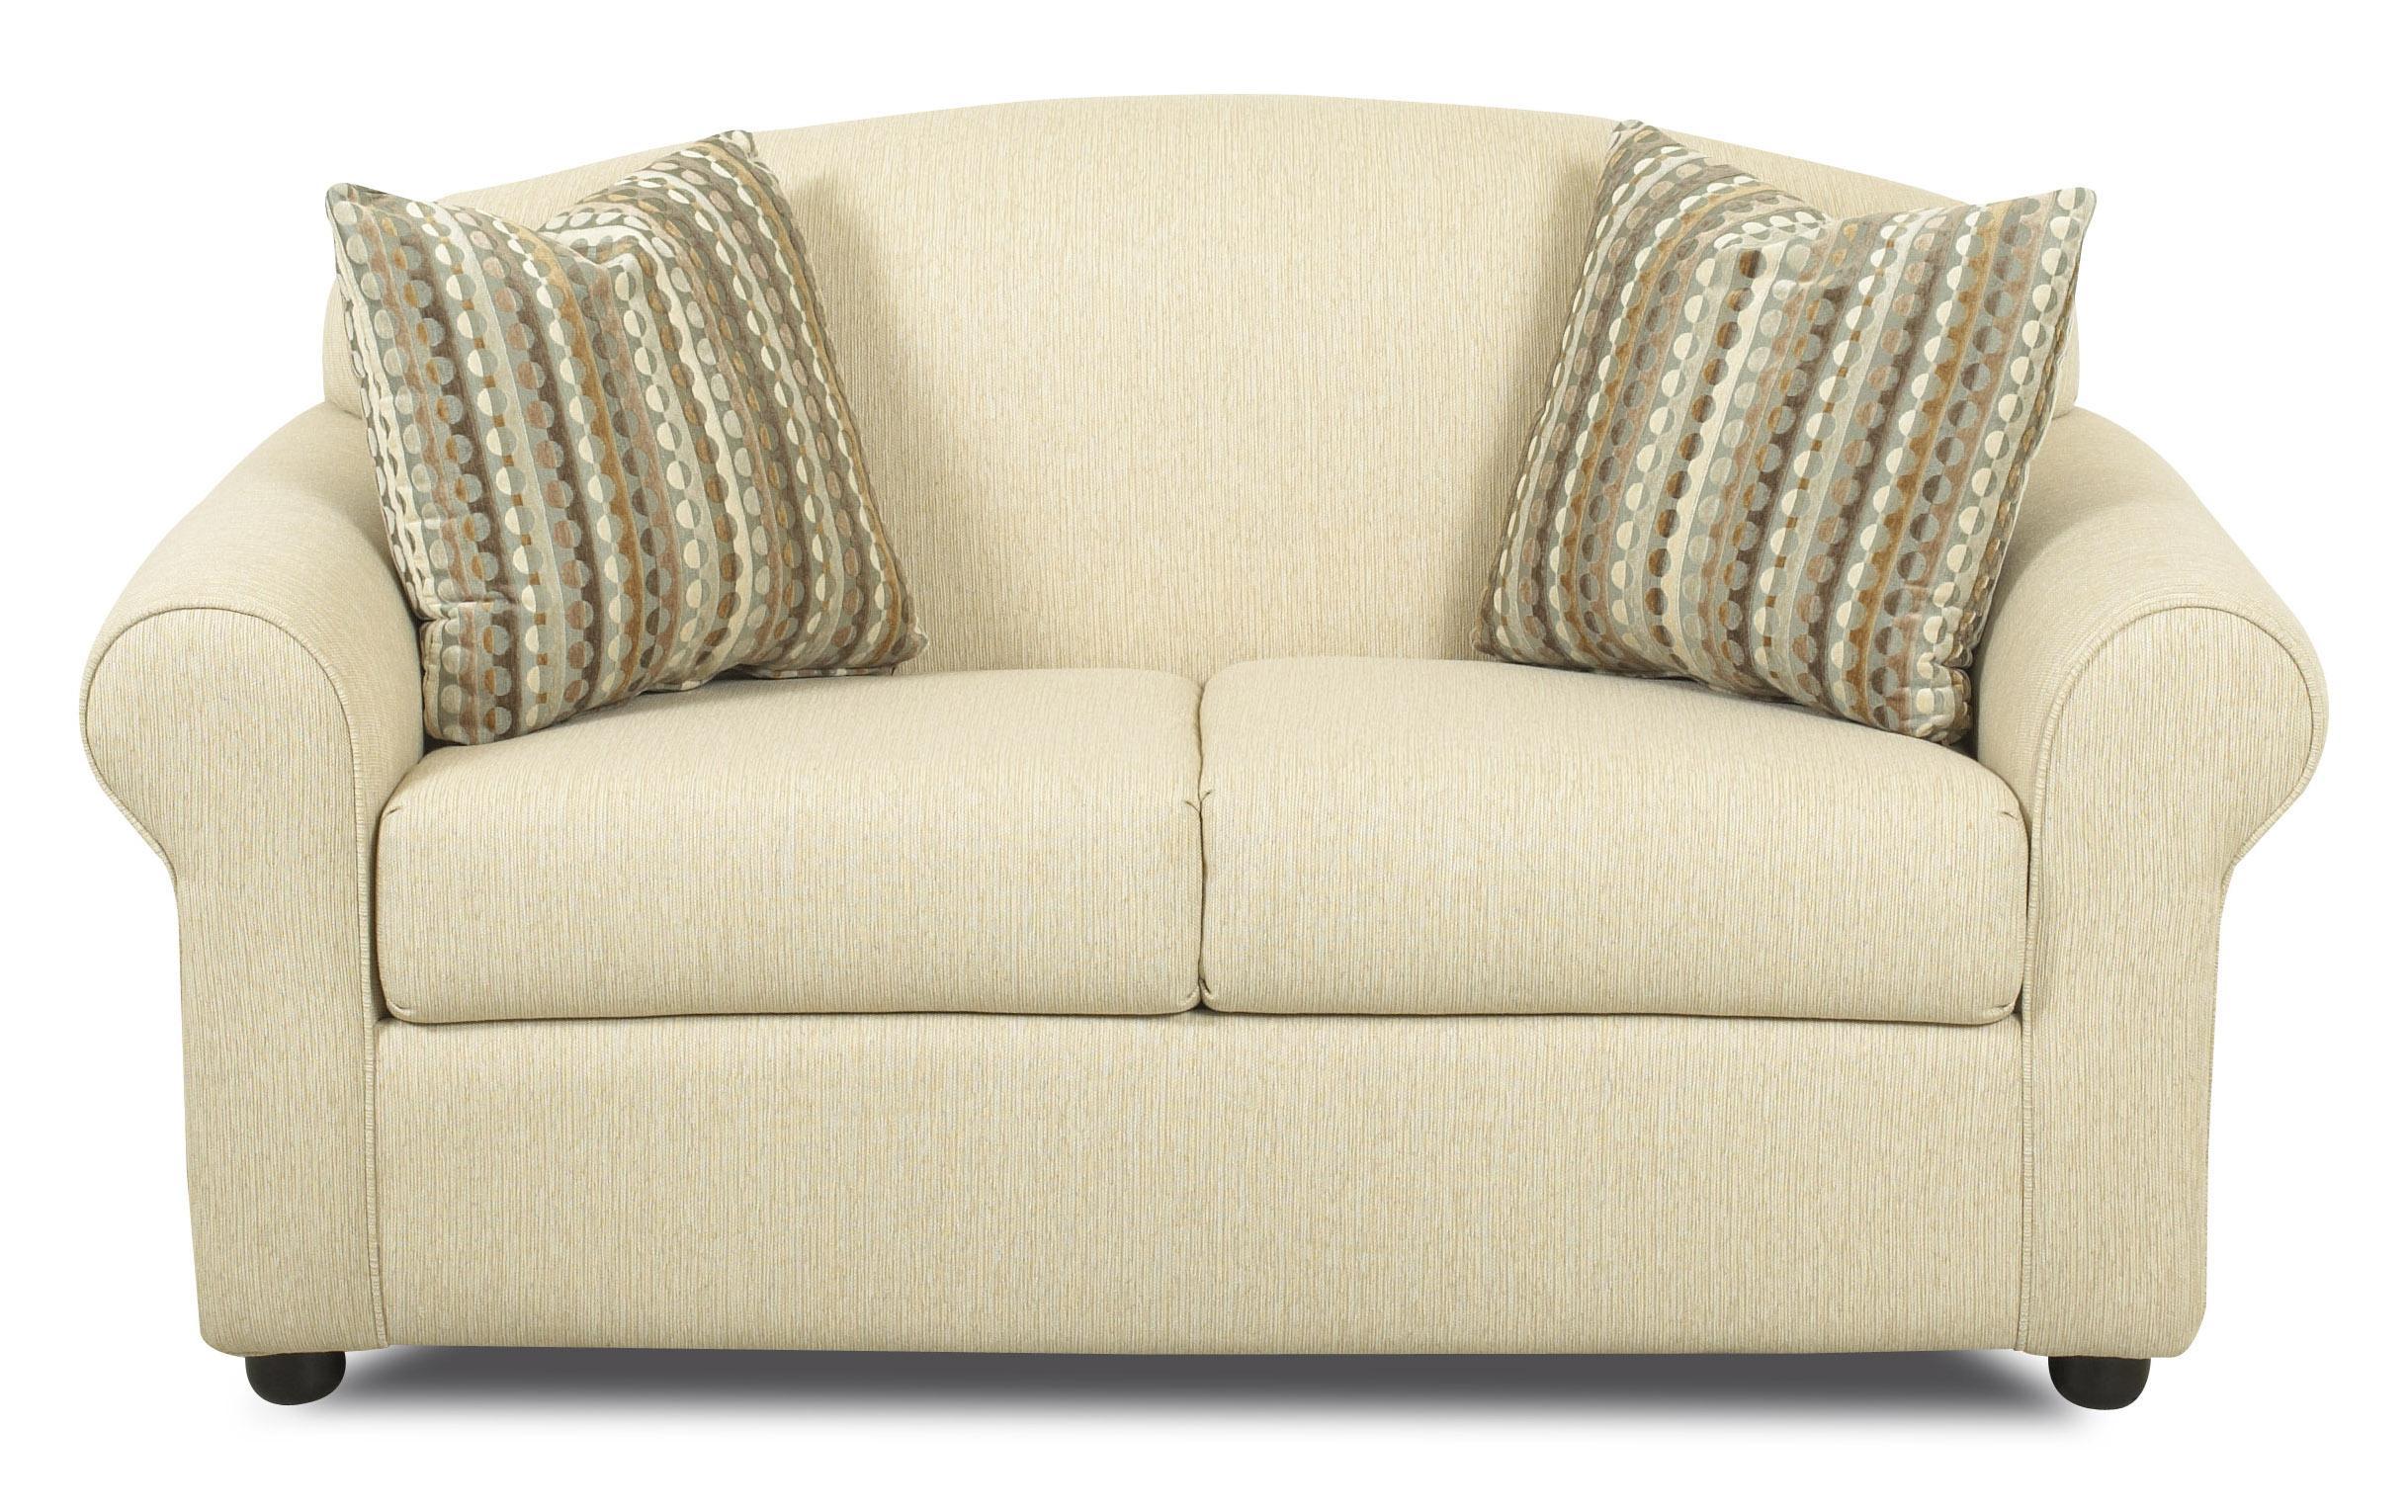 klaussner possibilities 500 itsl innerspring twin sleeper loveseat dunk bright furniture. Black Bedroom Furniture Sets. Home Design Ideas